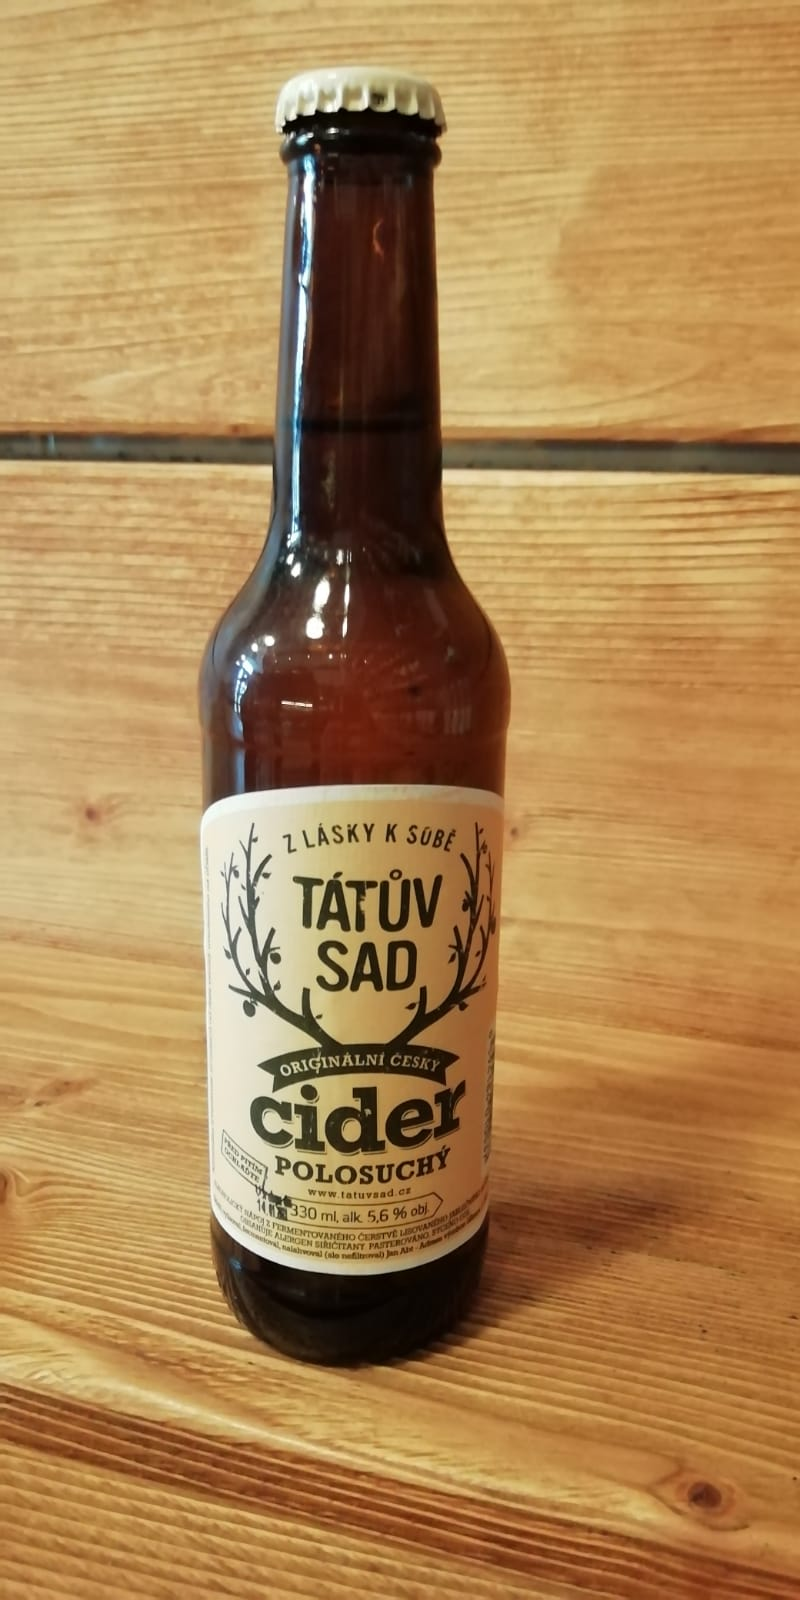 Tátův sad Cider polosuchy